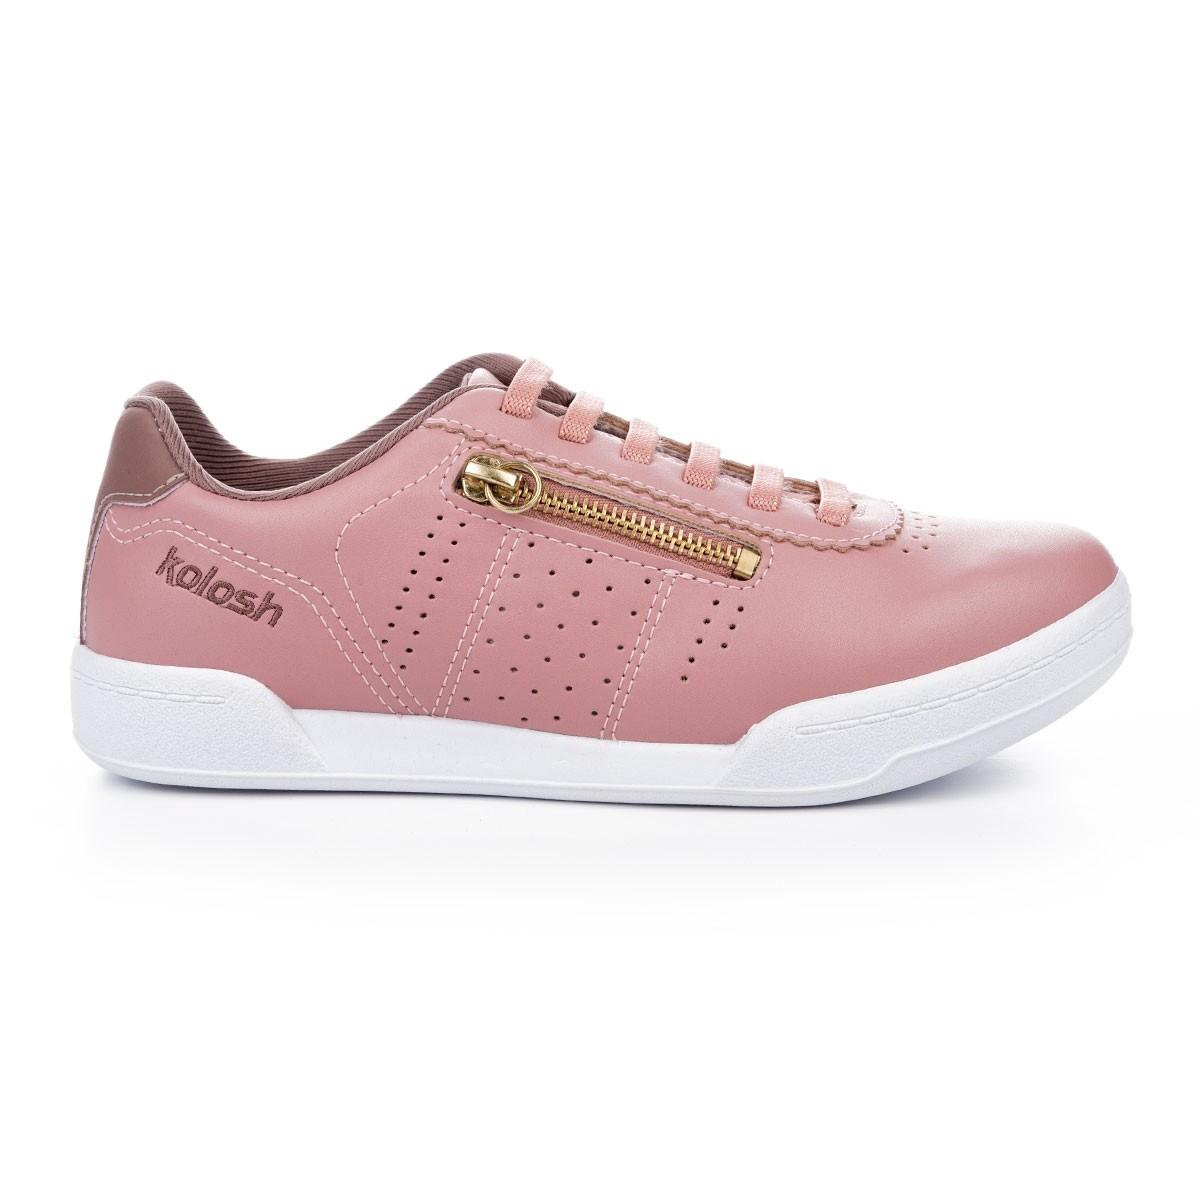 Tenis Kolosh Rosa Feminino C1665